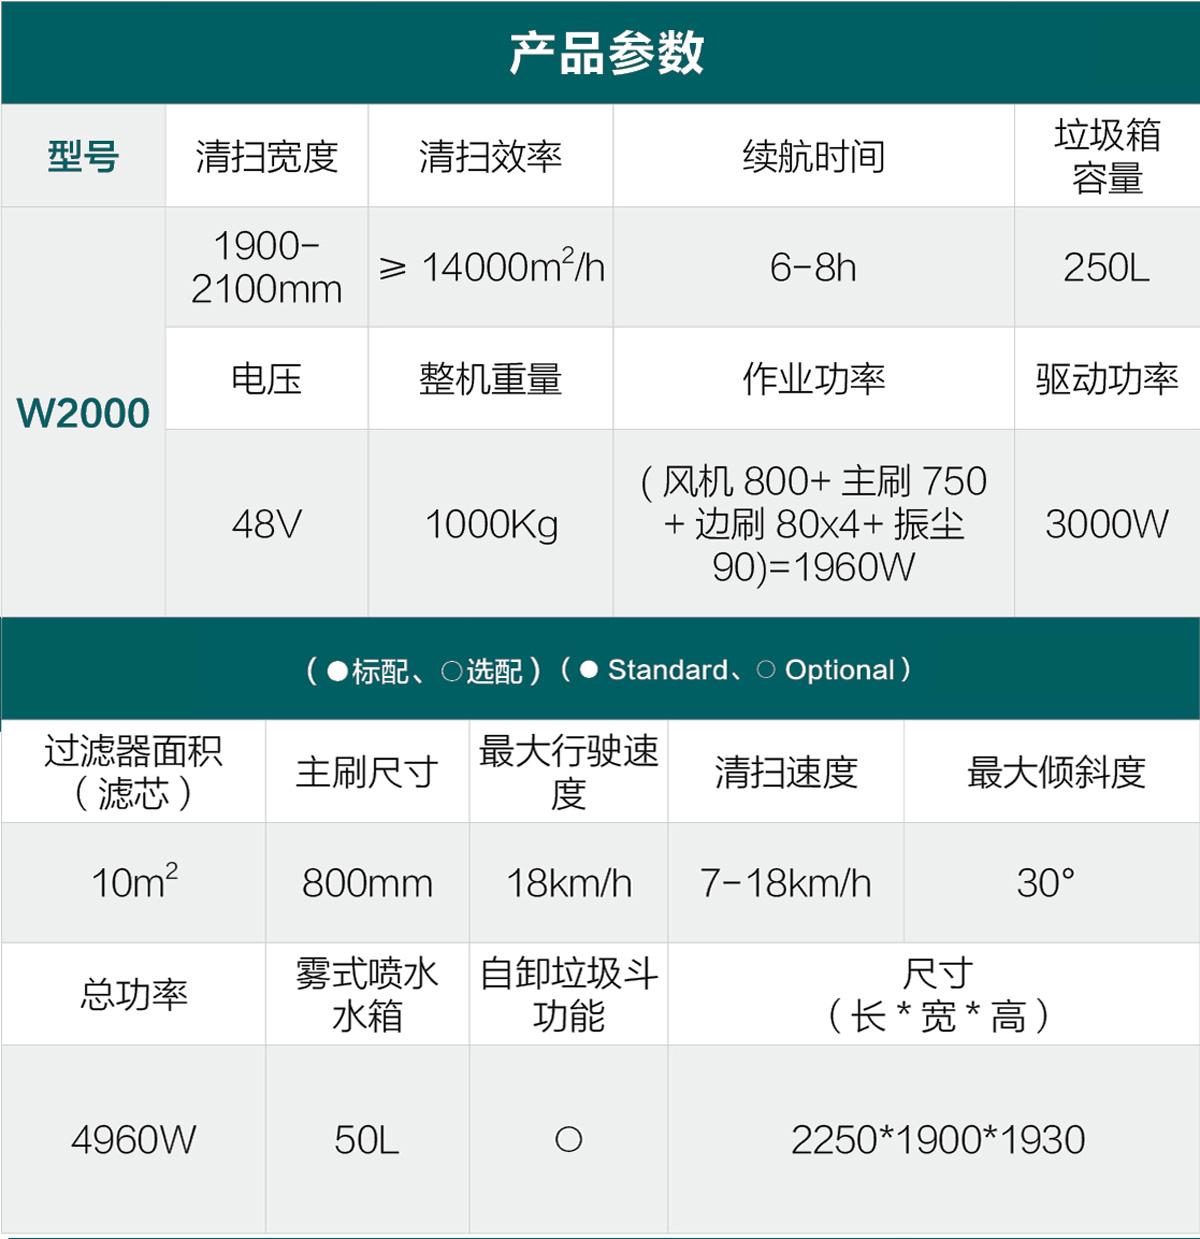 W2000产品参数